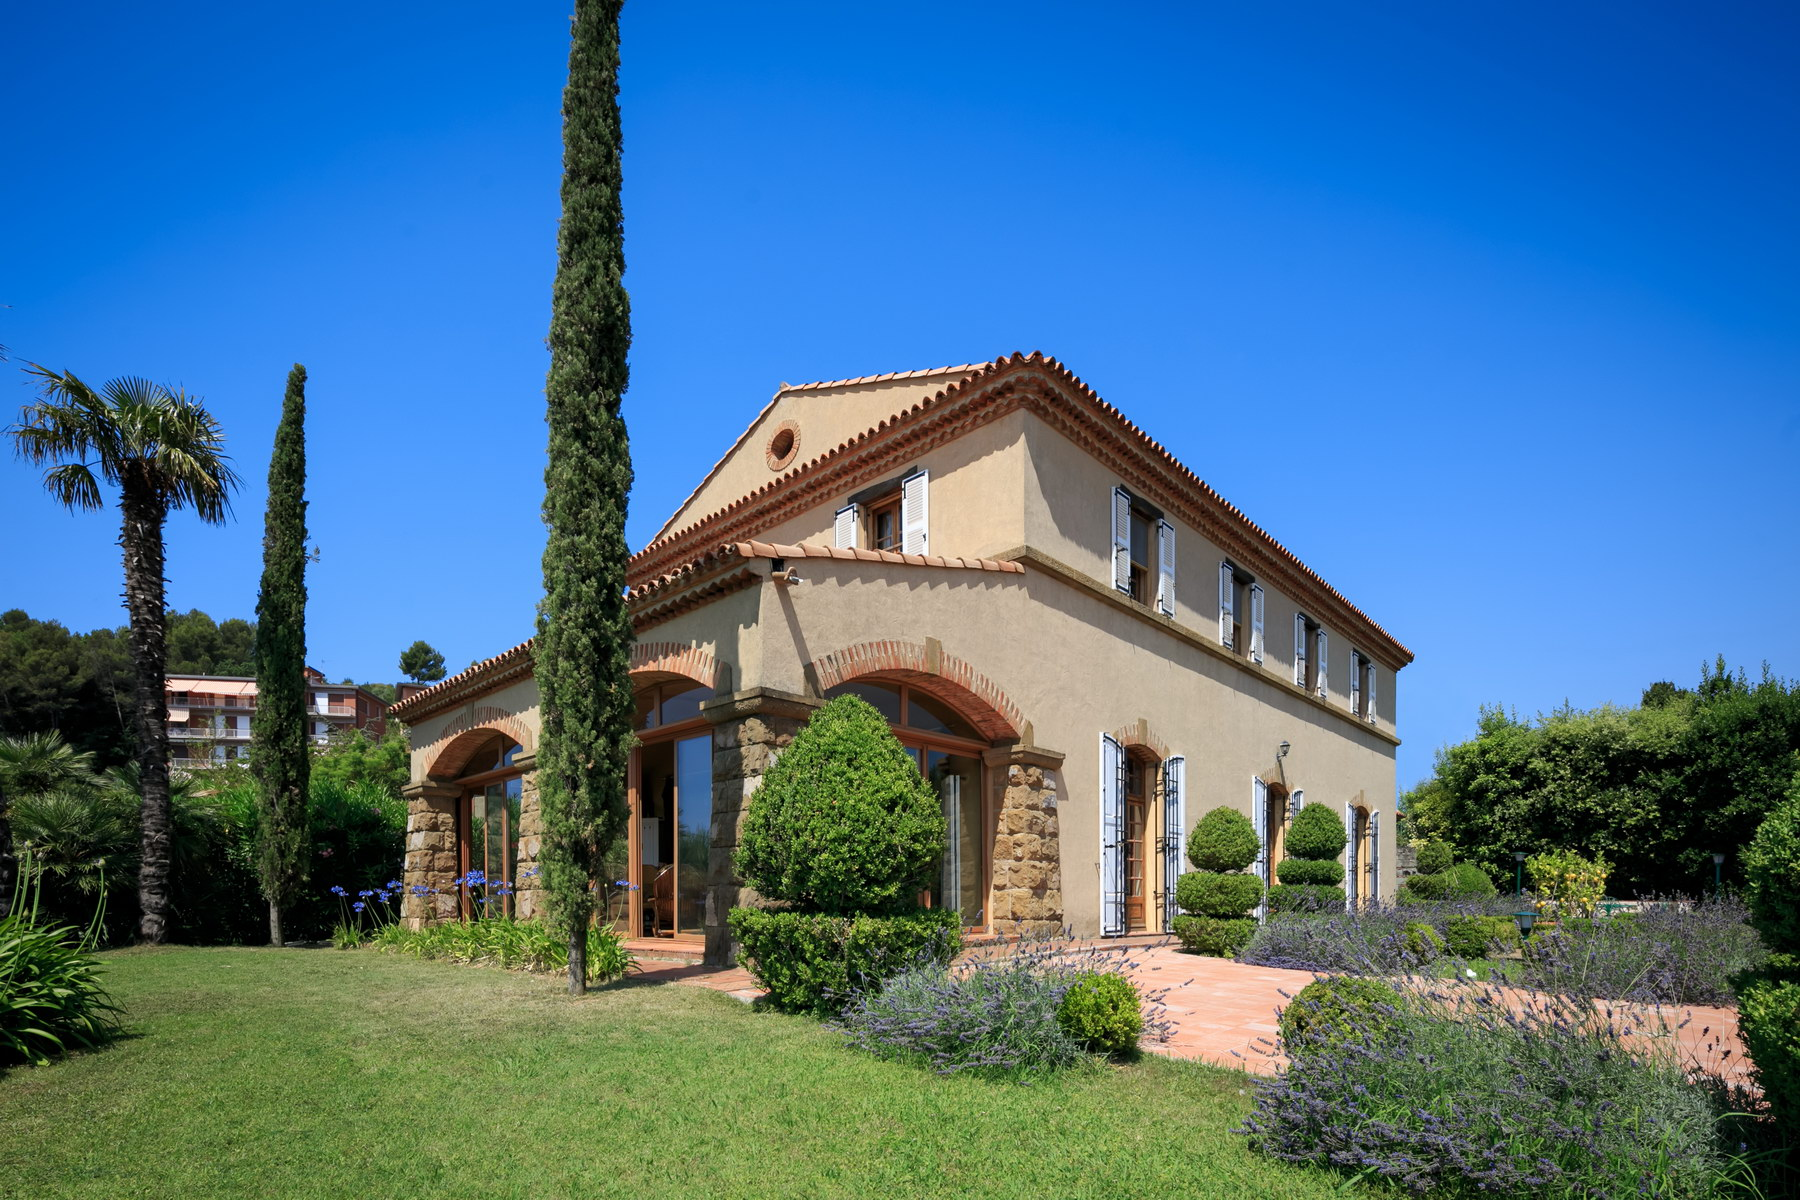 Villa in Vendita a Lerici: 5 locali, 620 mq - Foto 2